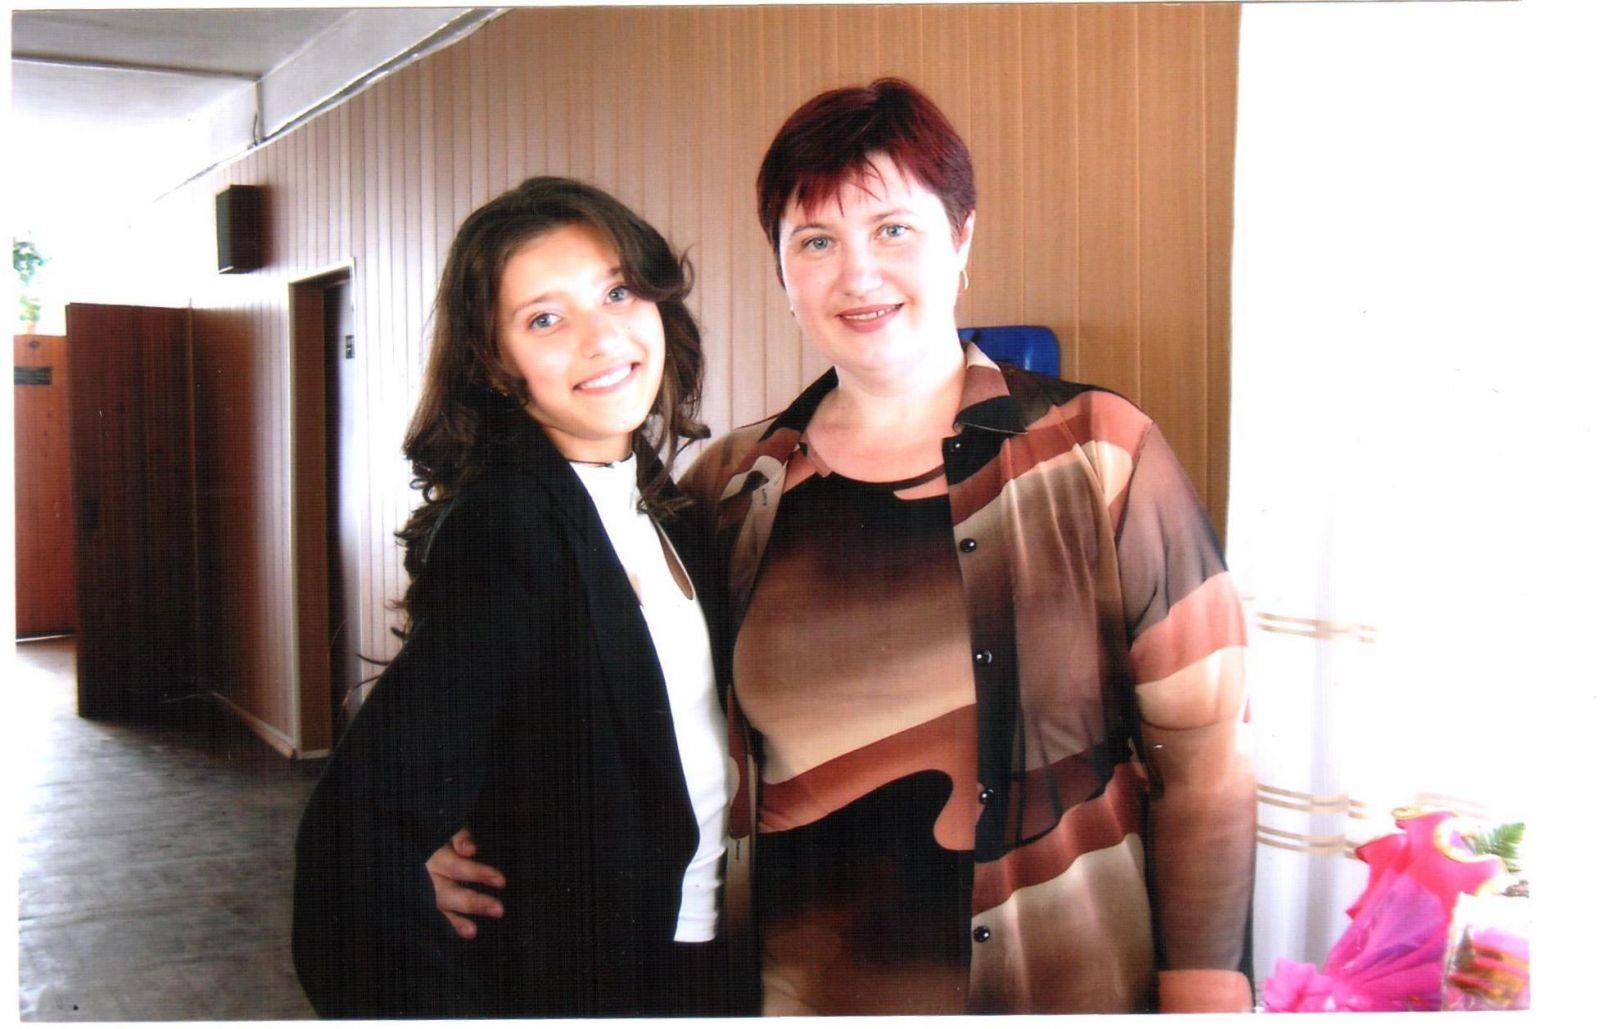 ведущая шоу Орел и Решка Регина Тодоренко в школе